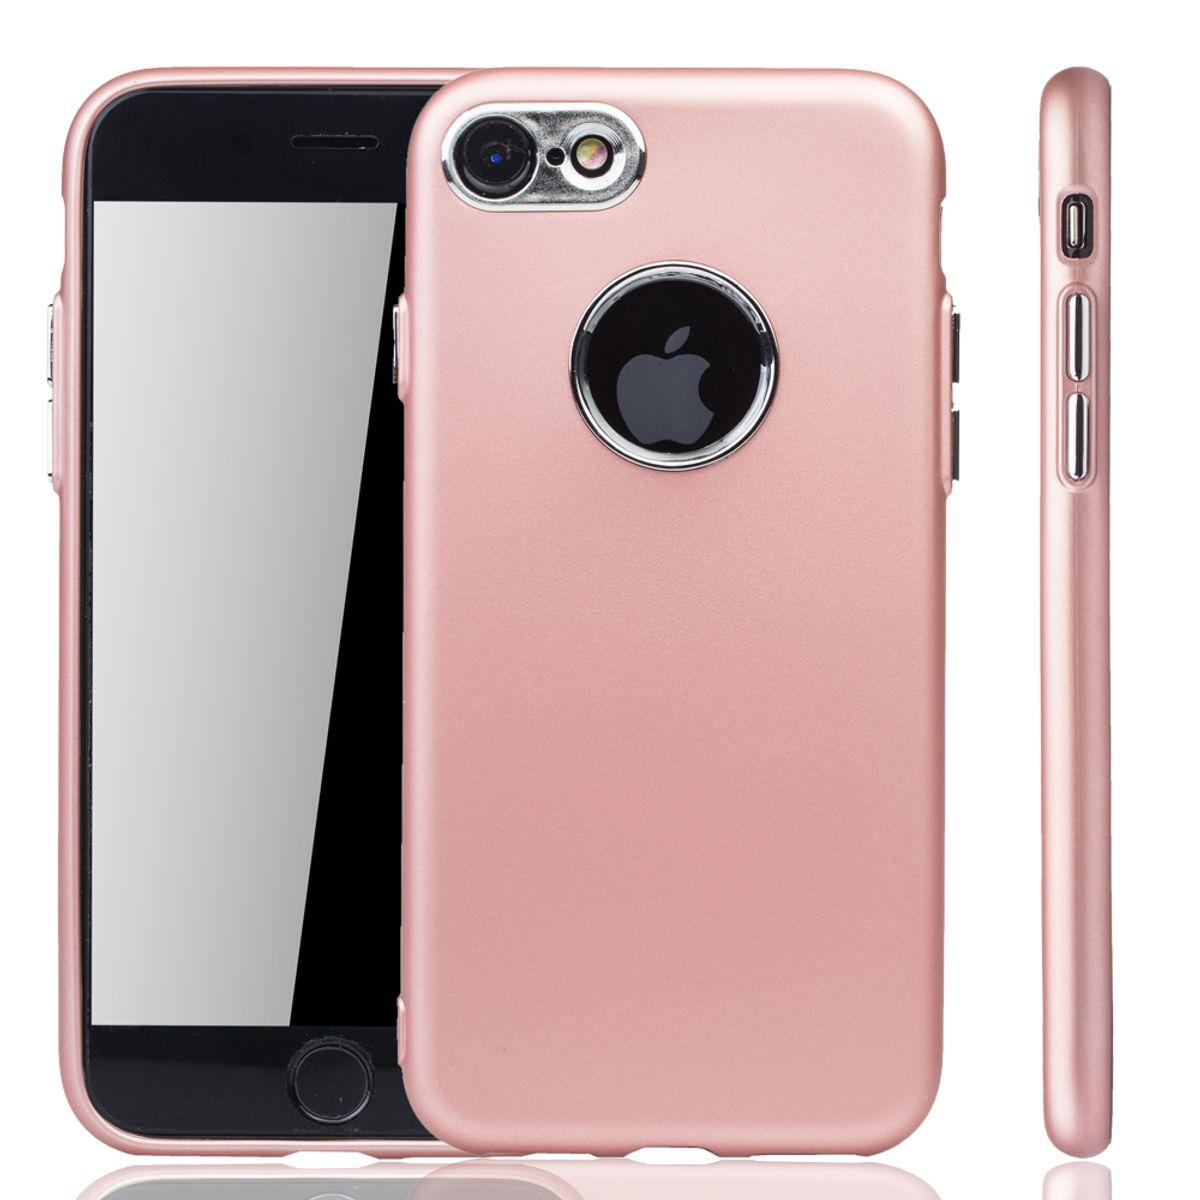 apple iphone 7 8 h lle handyh lle f r apple iphone 7 8 handy case in rose pink. Black Bedroom Furniture Sets. Home Design Ideas